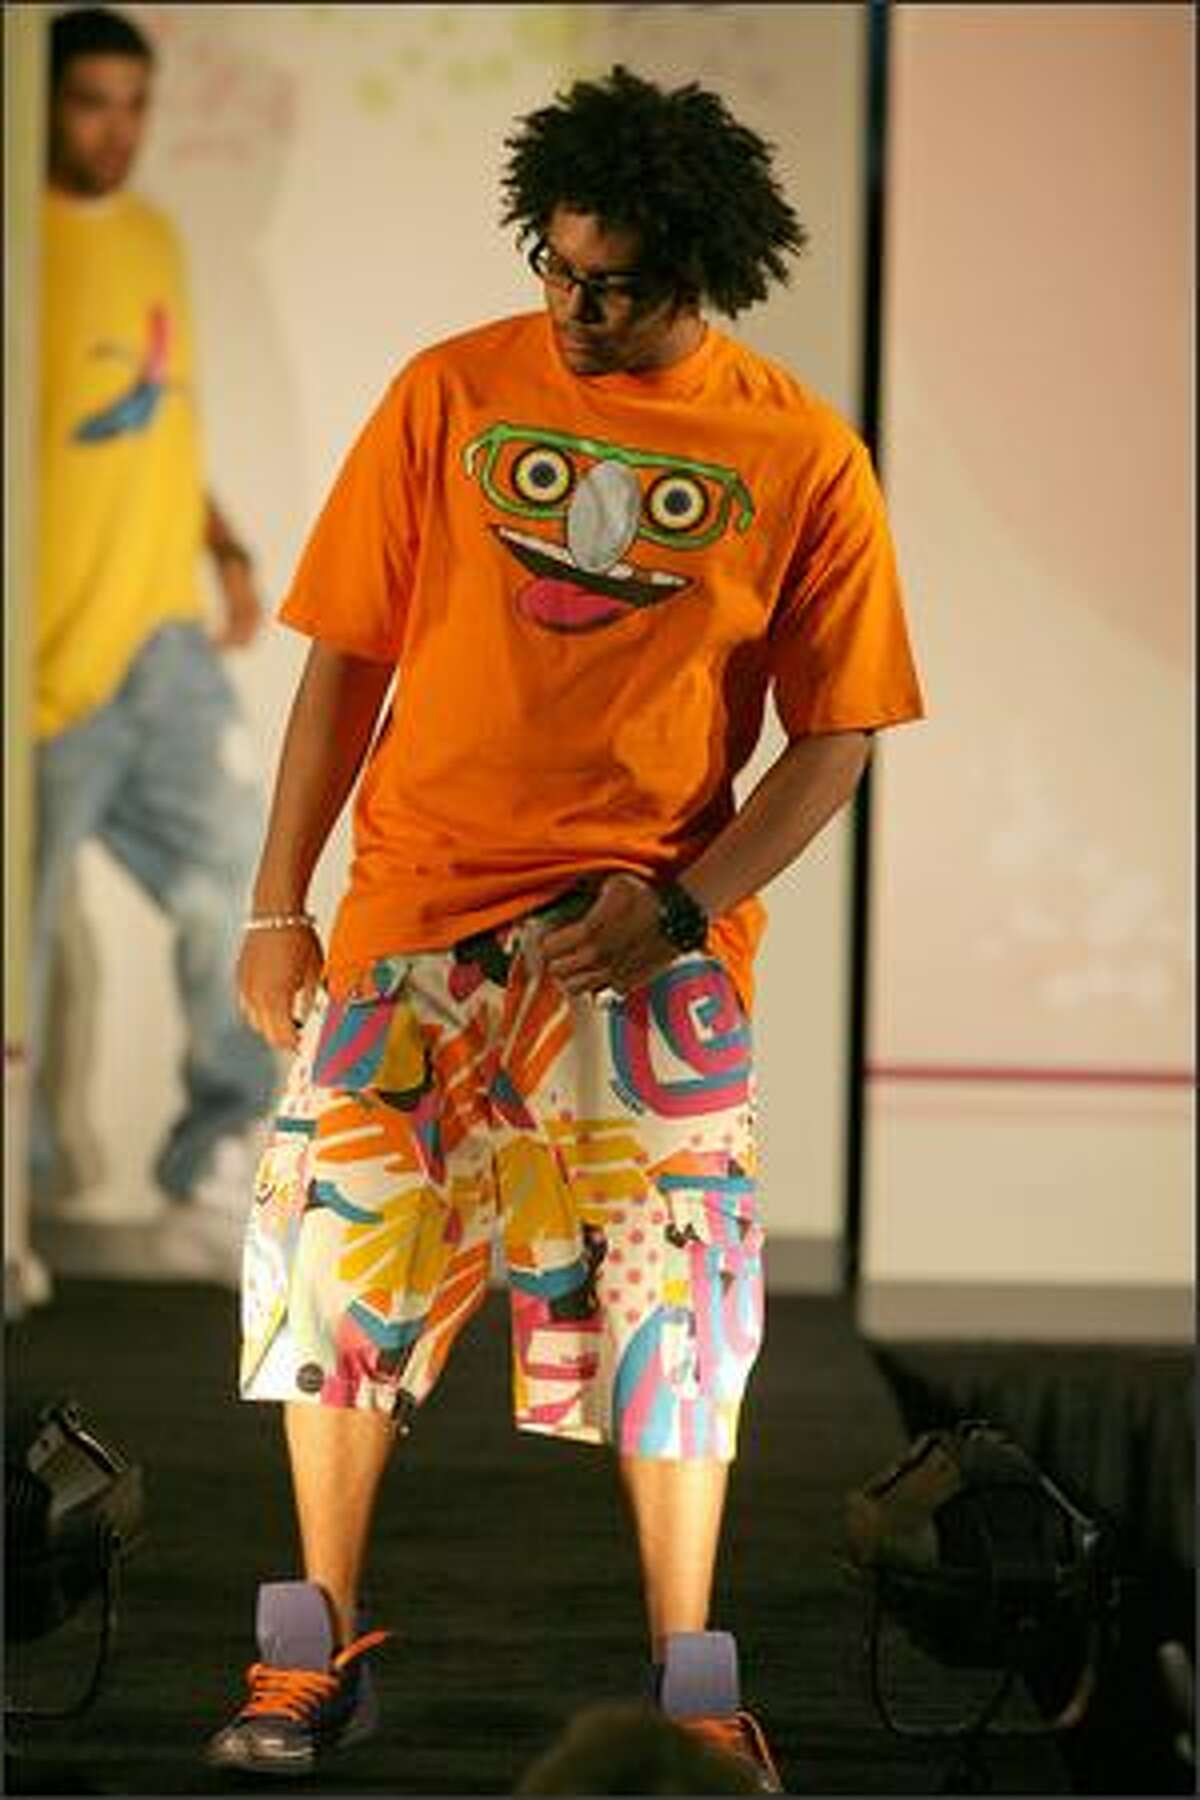 Joey McDaniel models the Home Boy T-shirt and Jam Shorts.